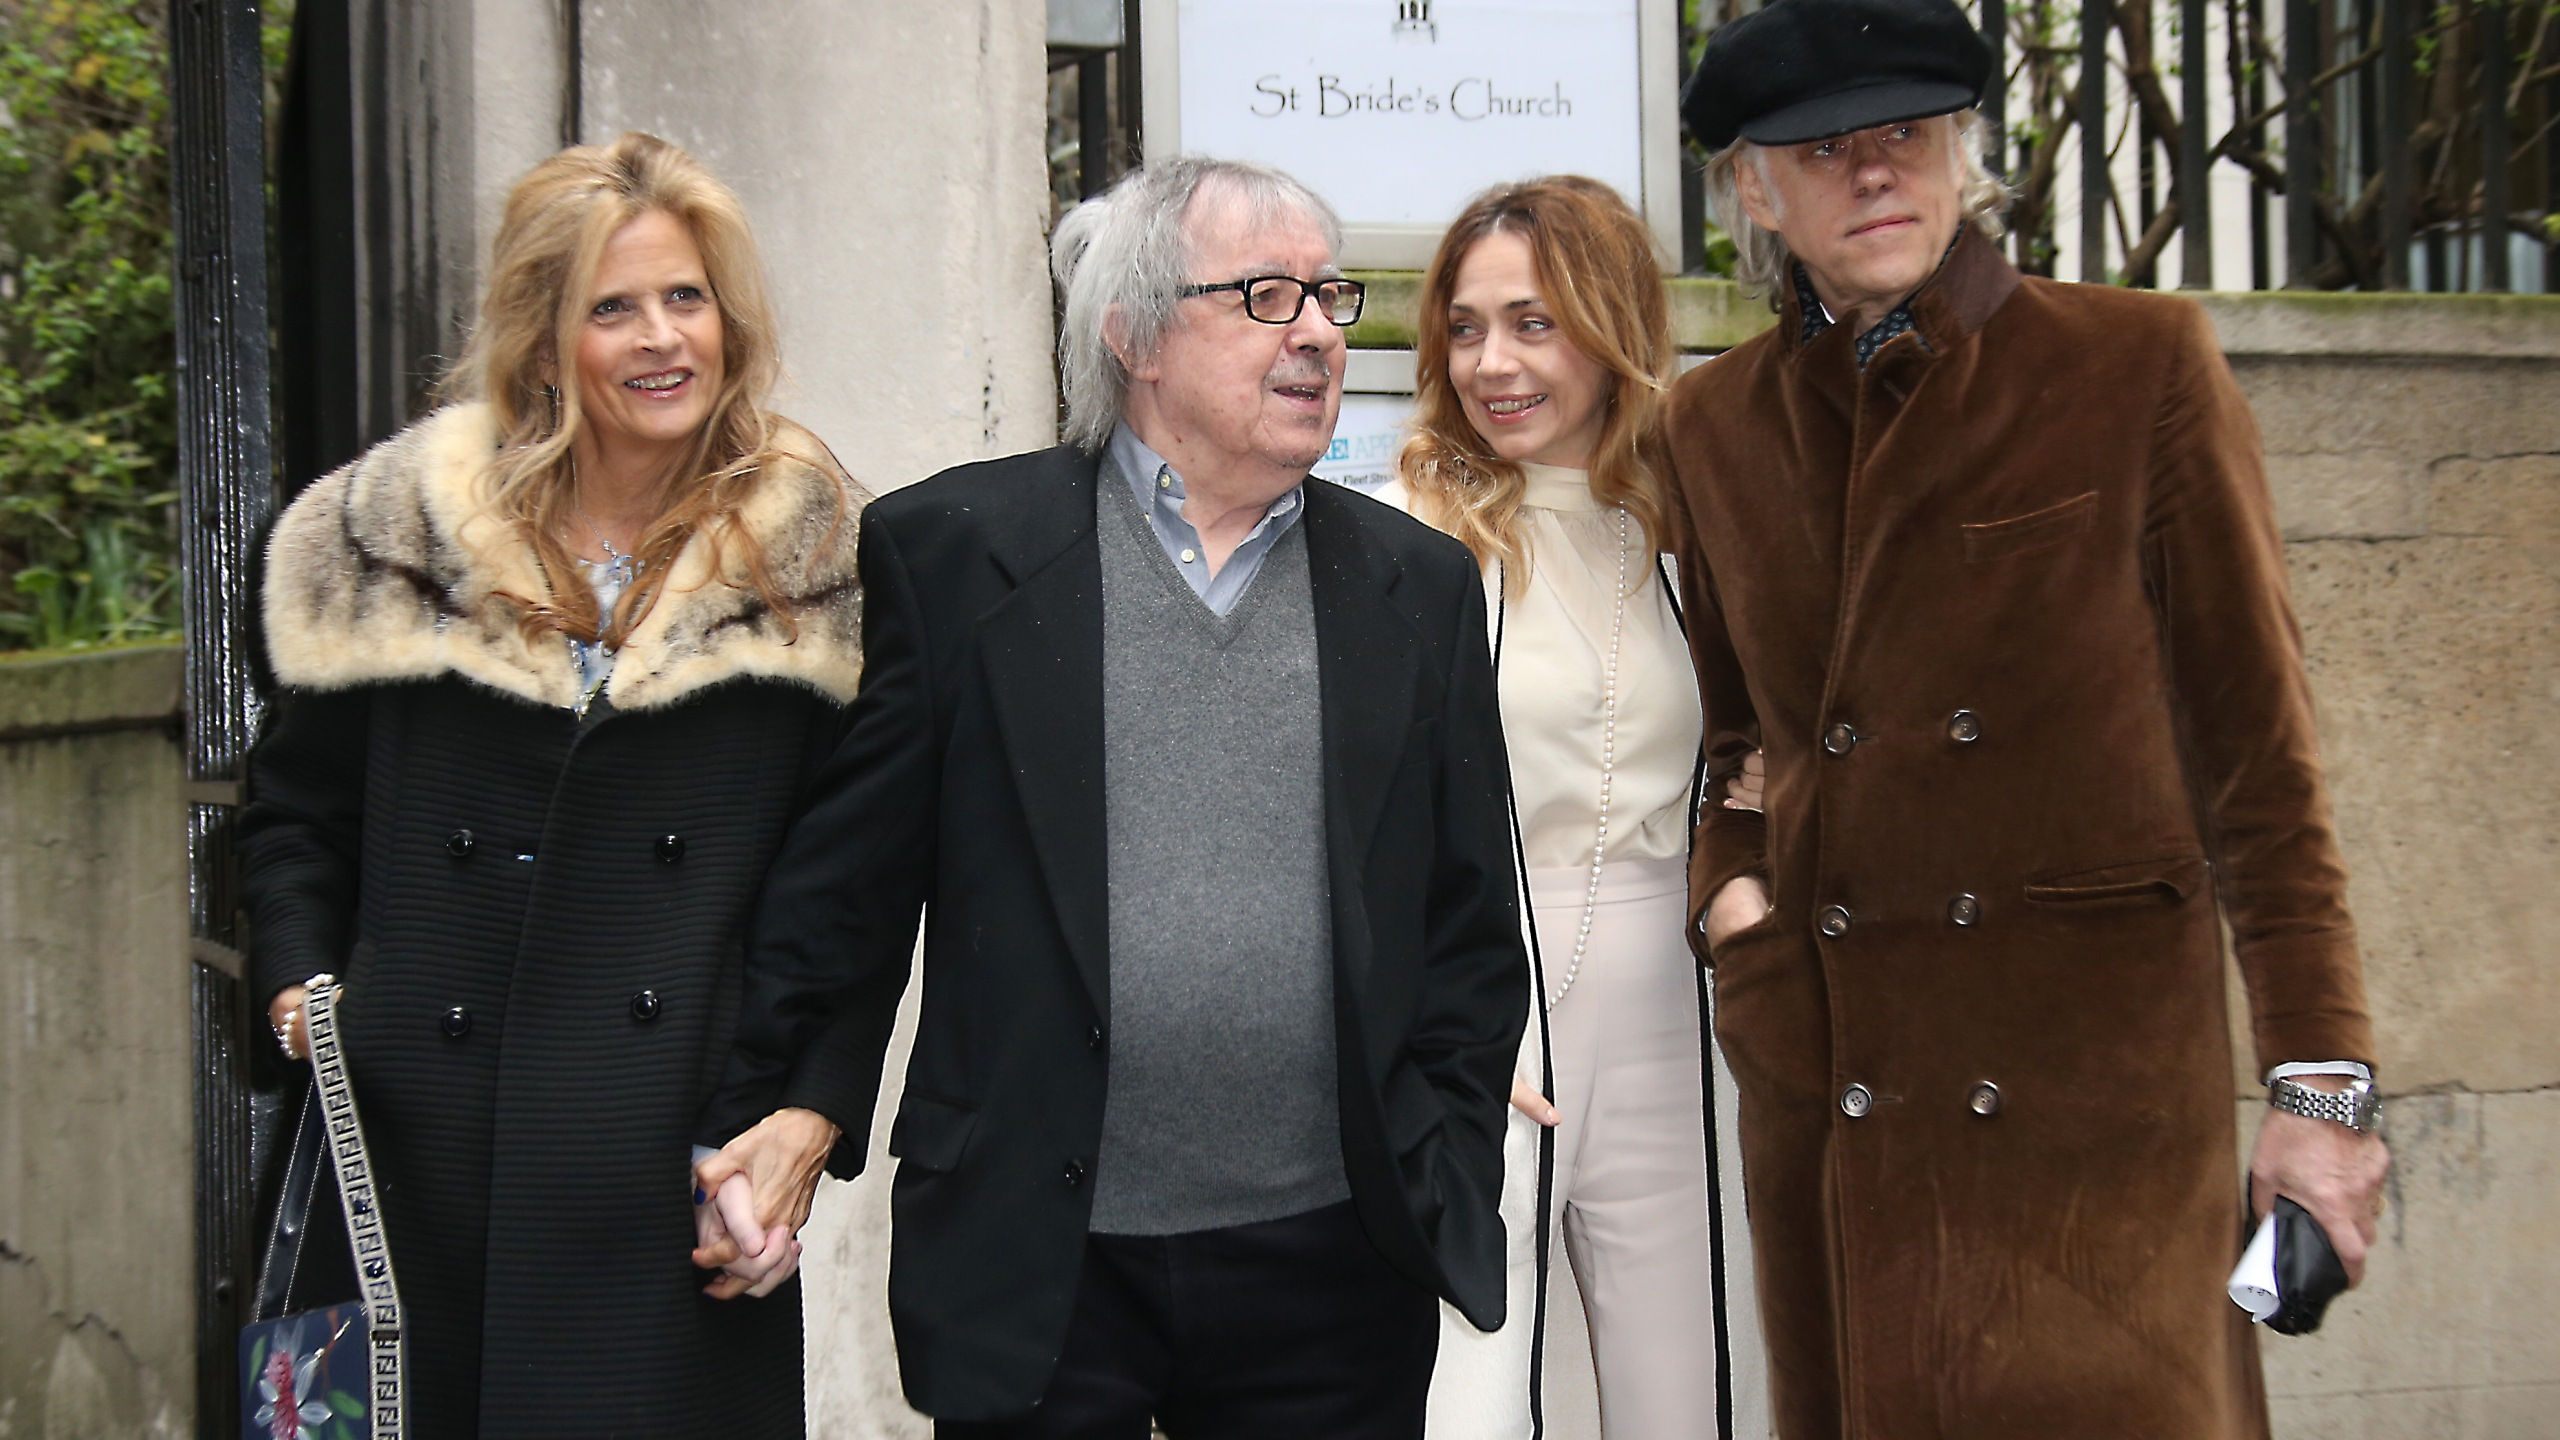 Suzanne Accosta, Bill Wyman, Bob Geldof, Jeanne Marine_181483